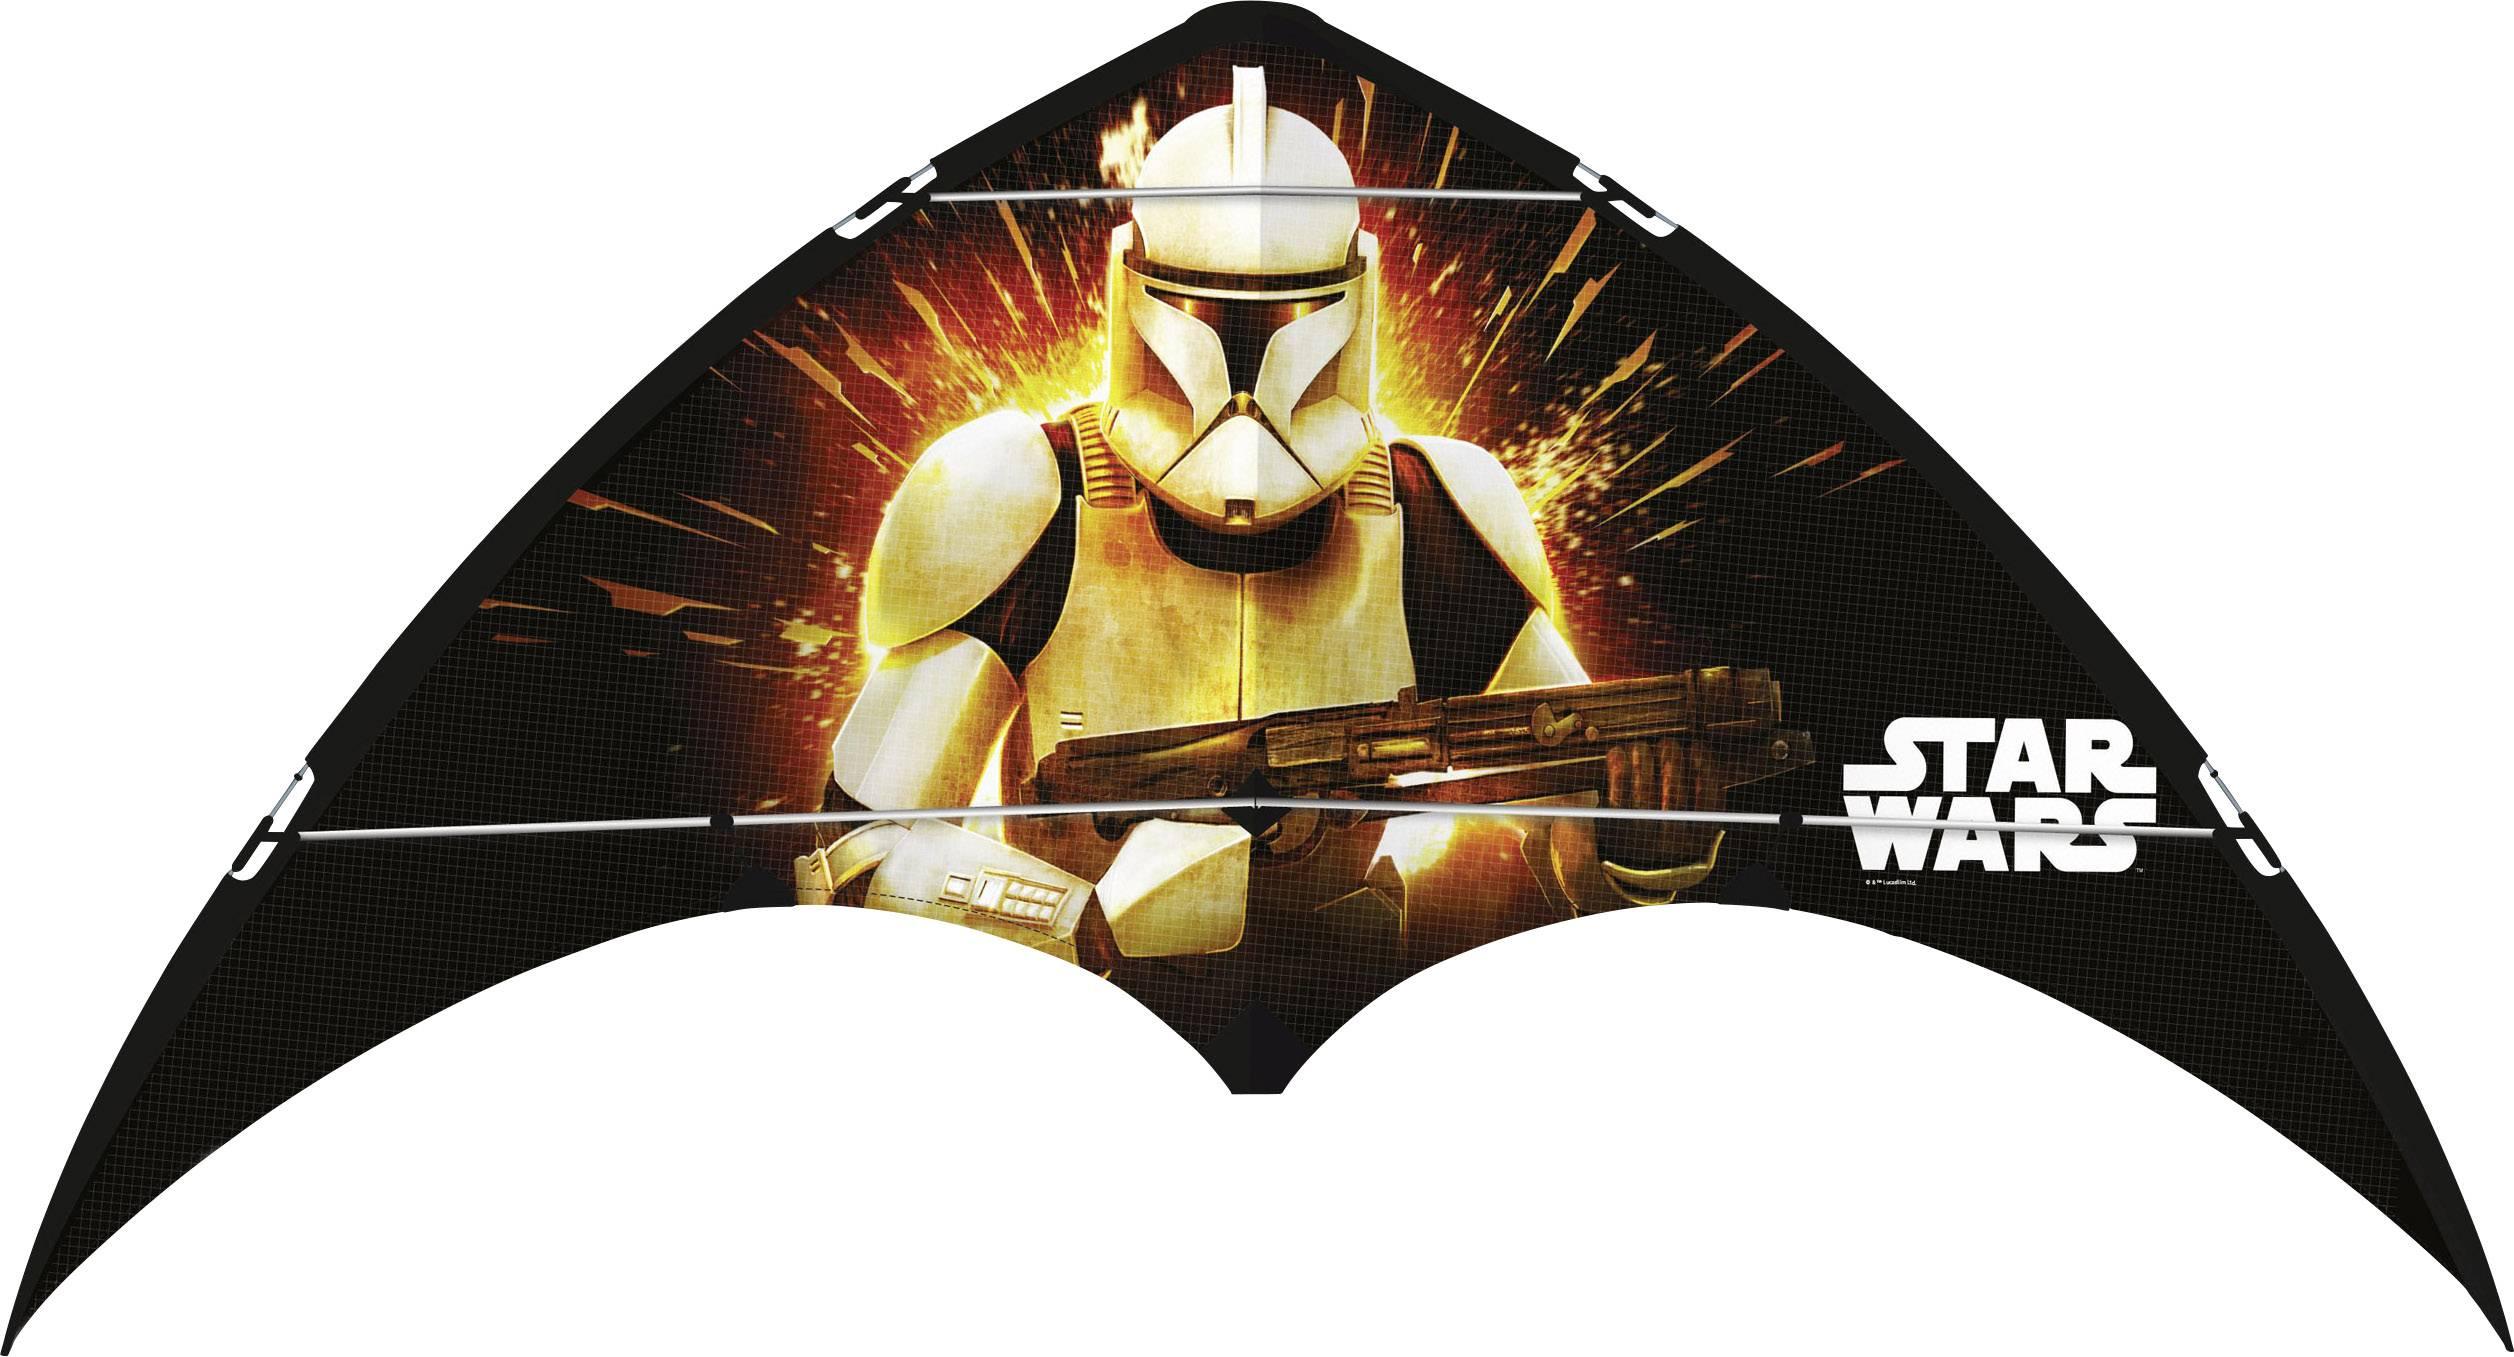 Športový šarkan jednošnúrový Star Wars Clone Troopers, Günther Flugspiele 1227, rozpätie 1200 mm